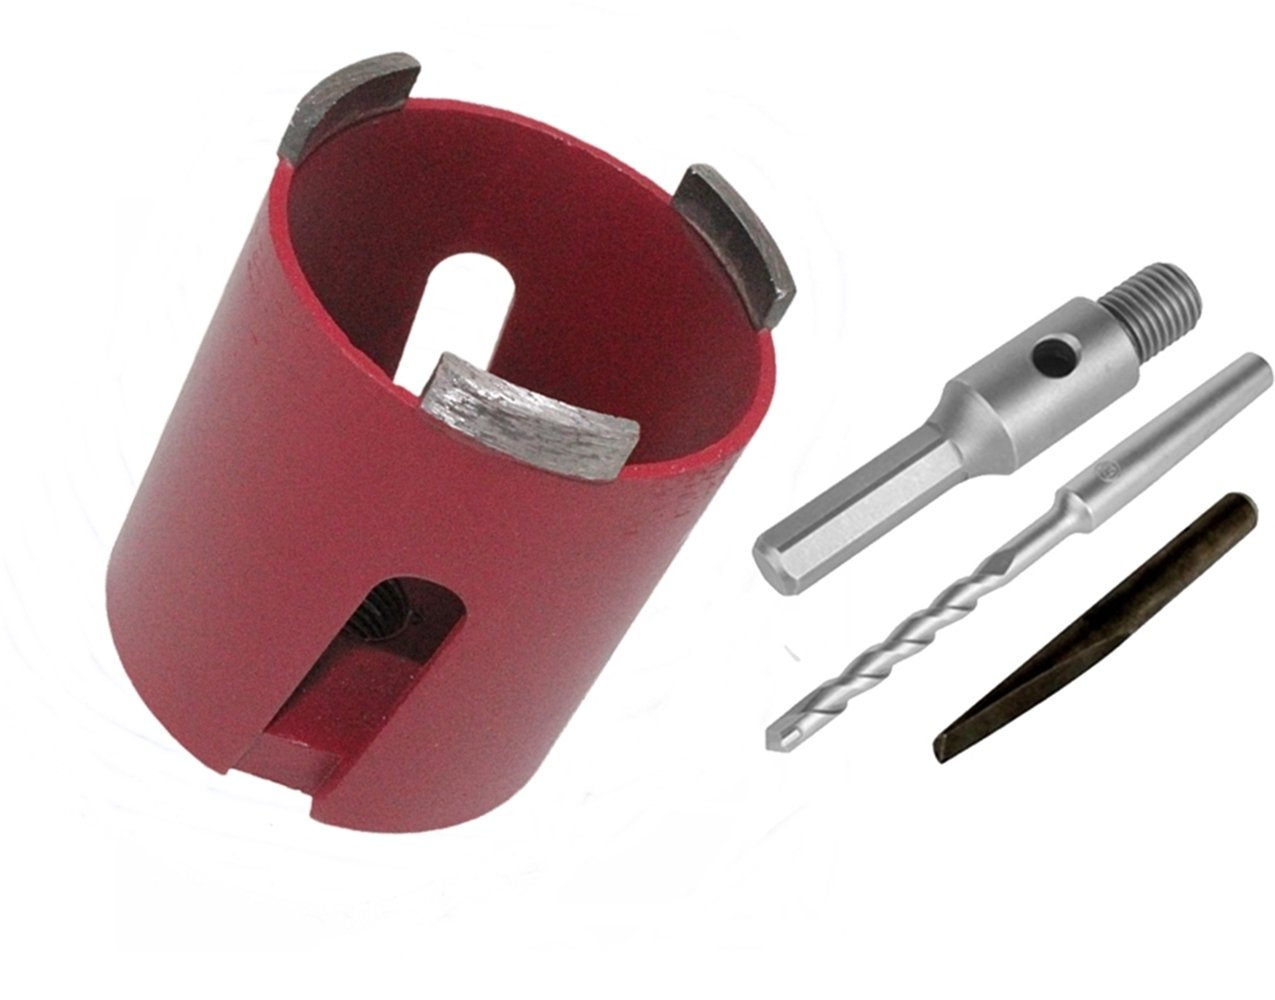 Diamant Dosensenker 68 / 82 mm Bohrkrone M16 SDS Aufnahme Sechskantaufnahme (Dosensenker 68 mm inkl. Sechskant Aufnahme) expotools